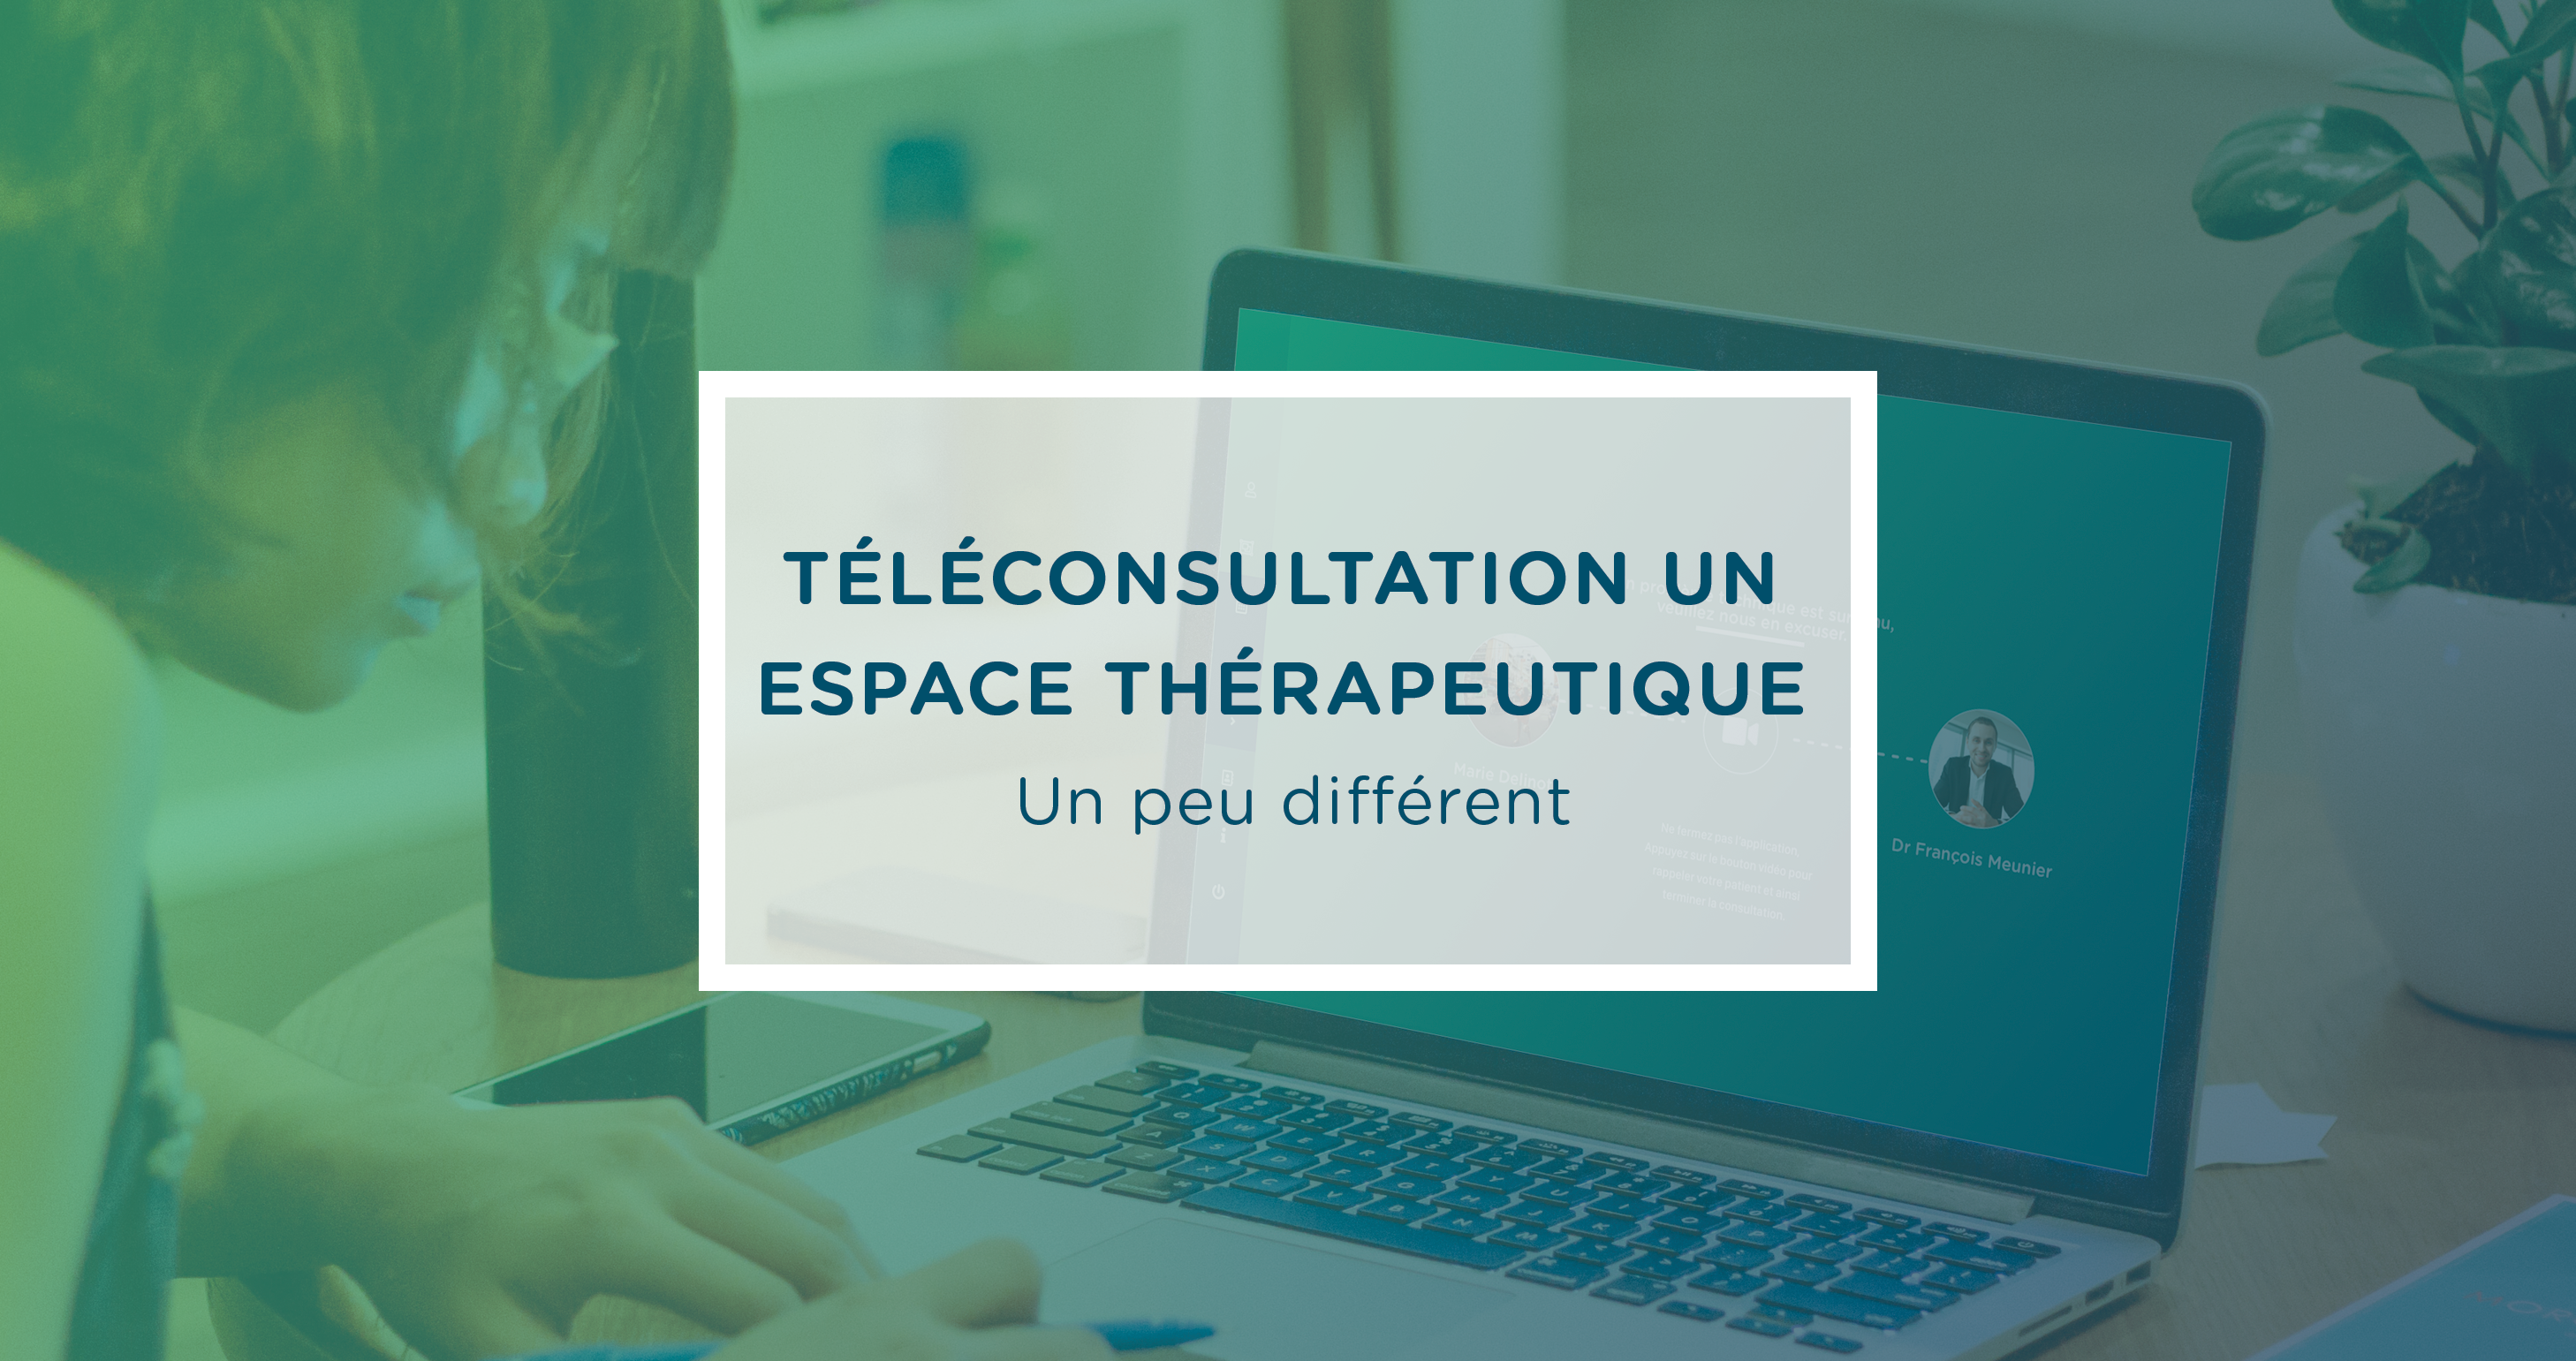 teleconsultation-espace-therapeutique-different